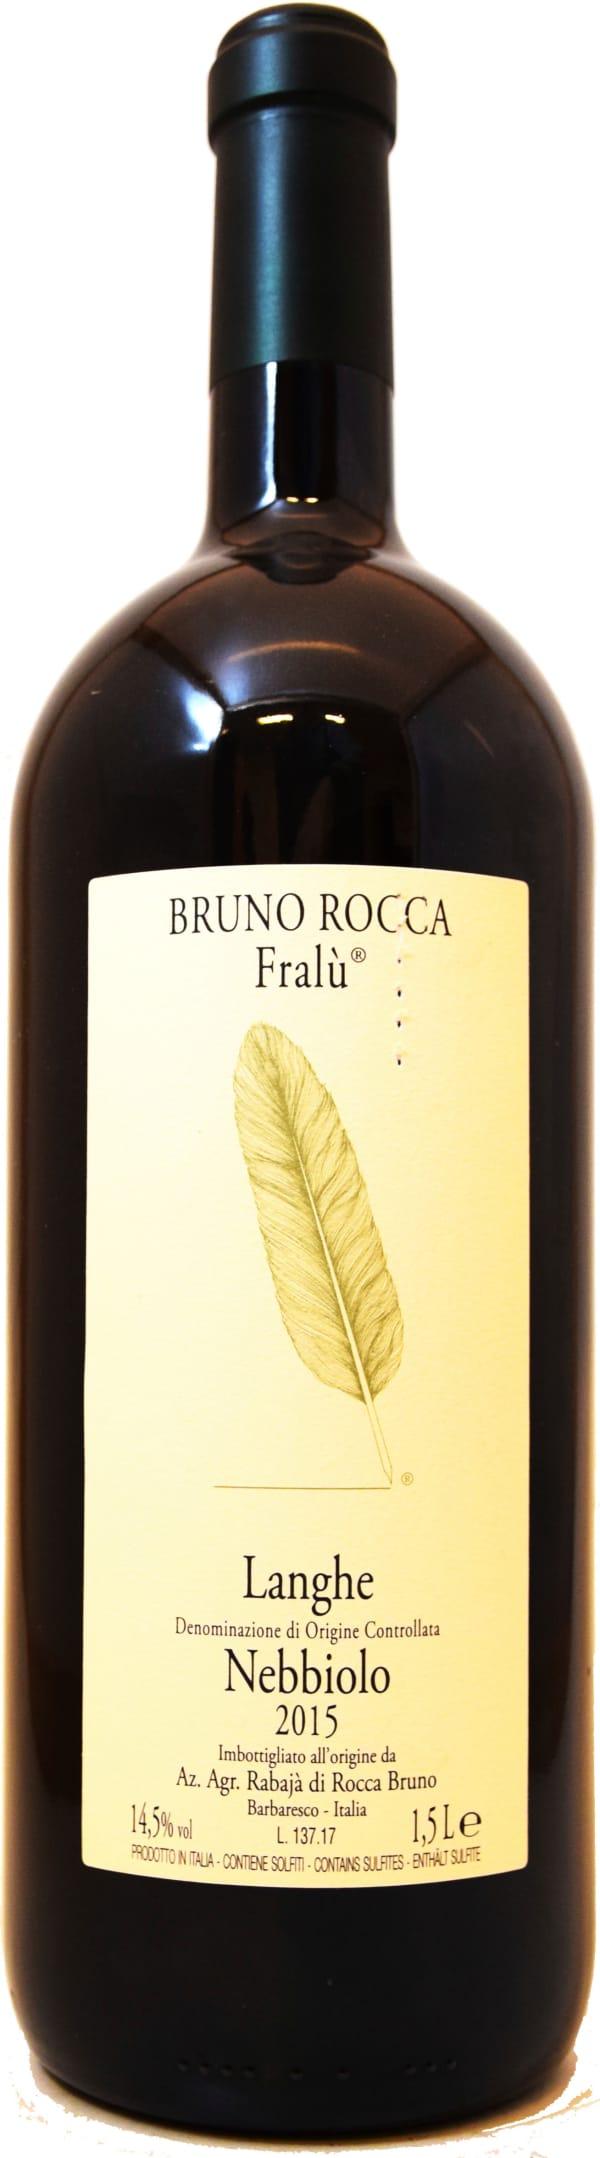 Bruno Rocca Fralu Nebbiolo Magnum 2019